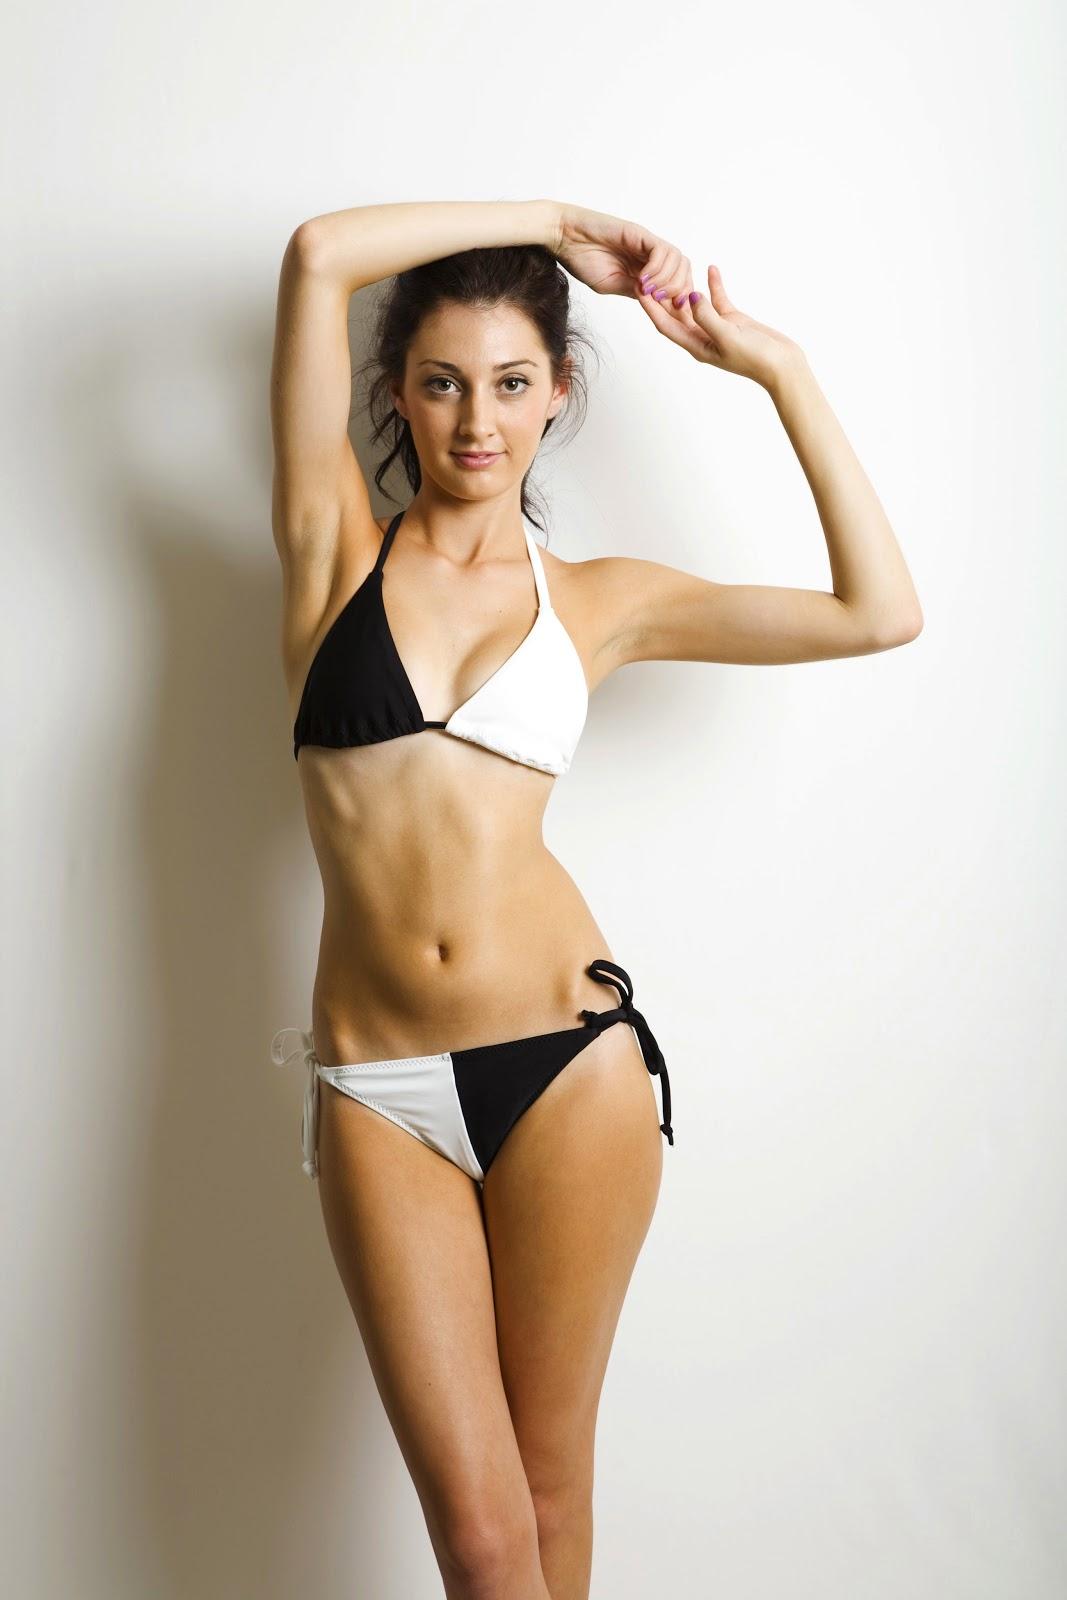 Mistress carrie bikini pictures — photo 11